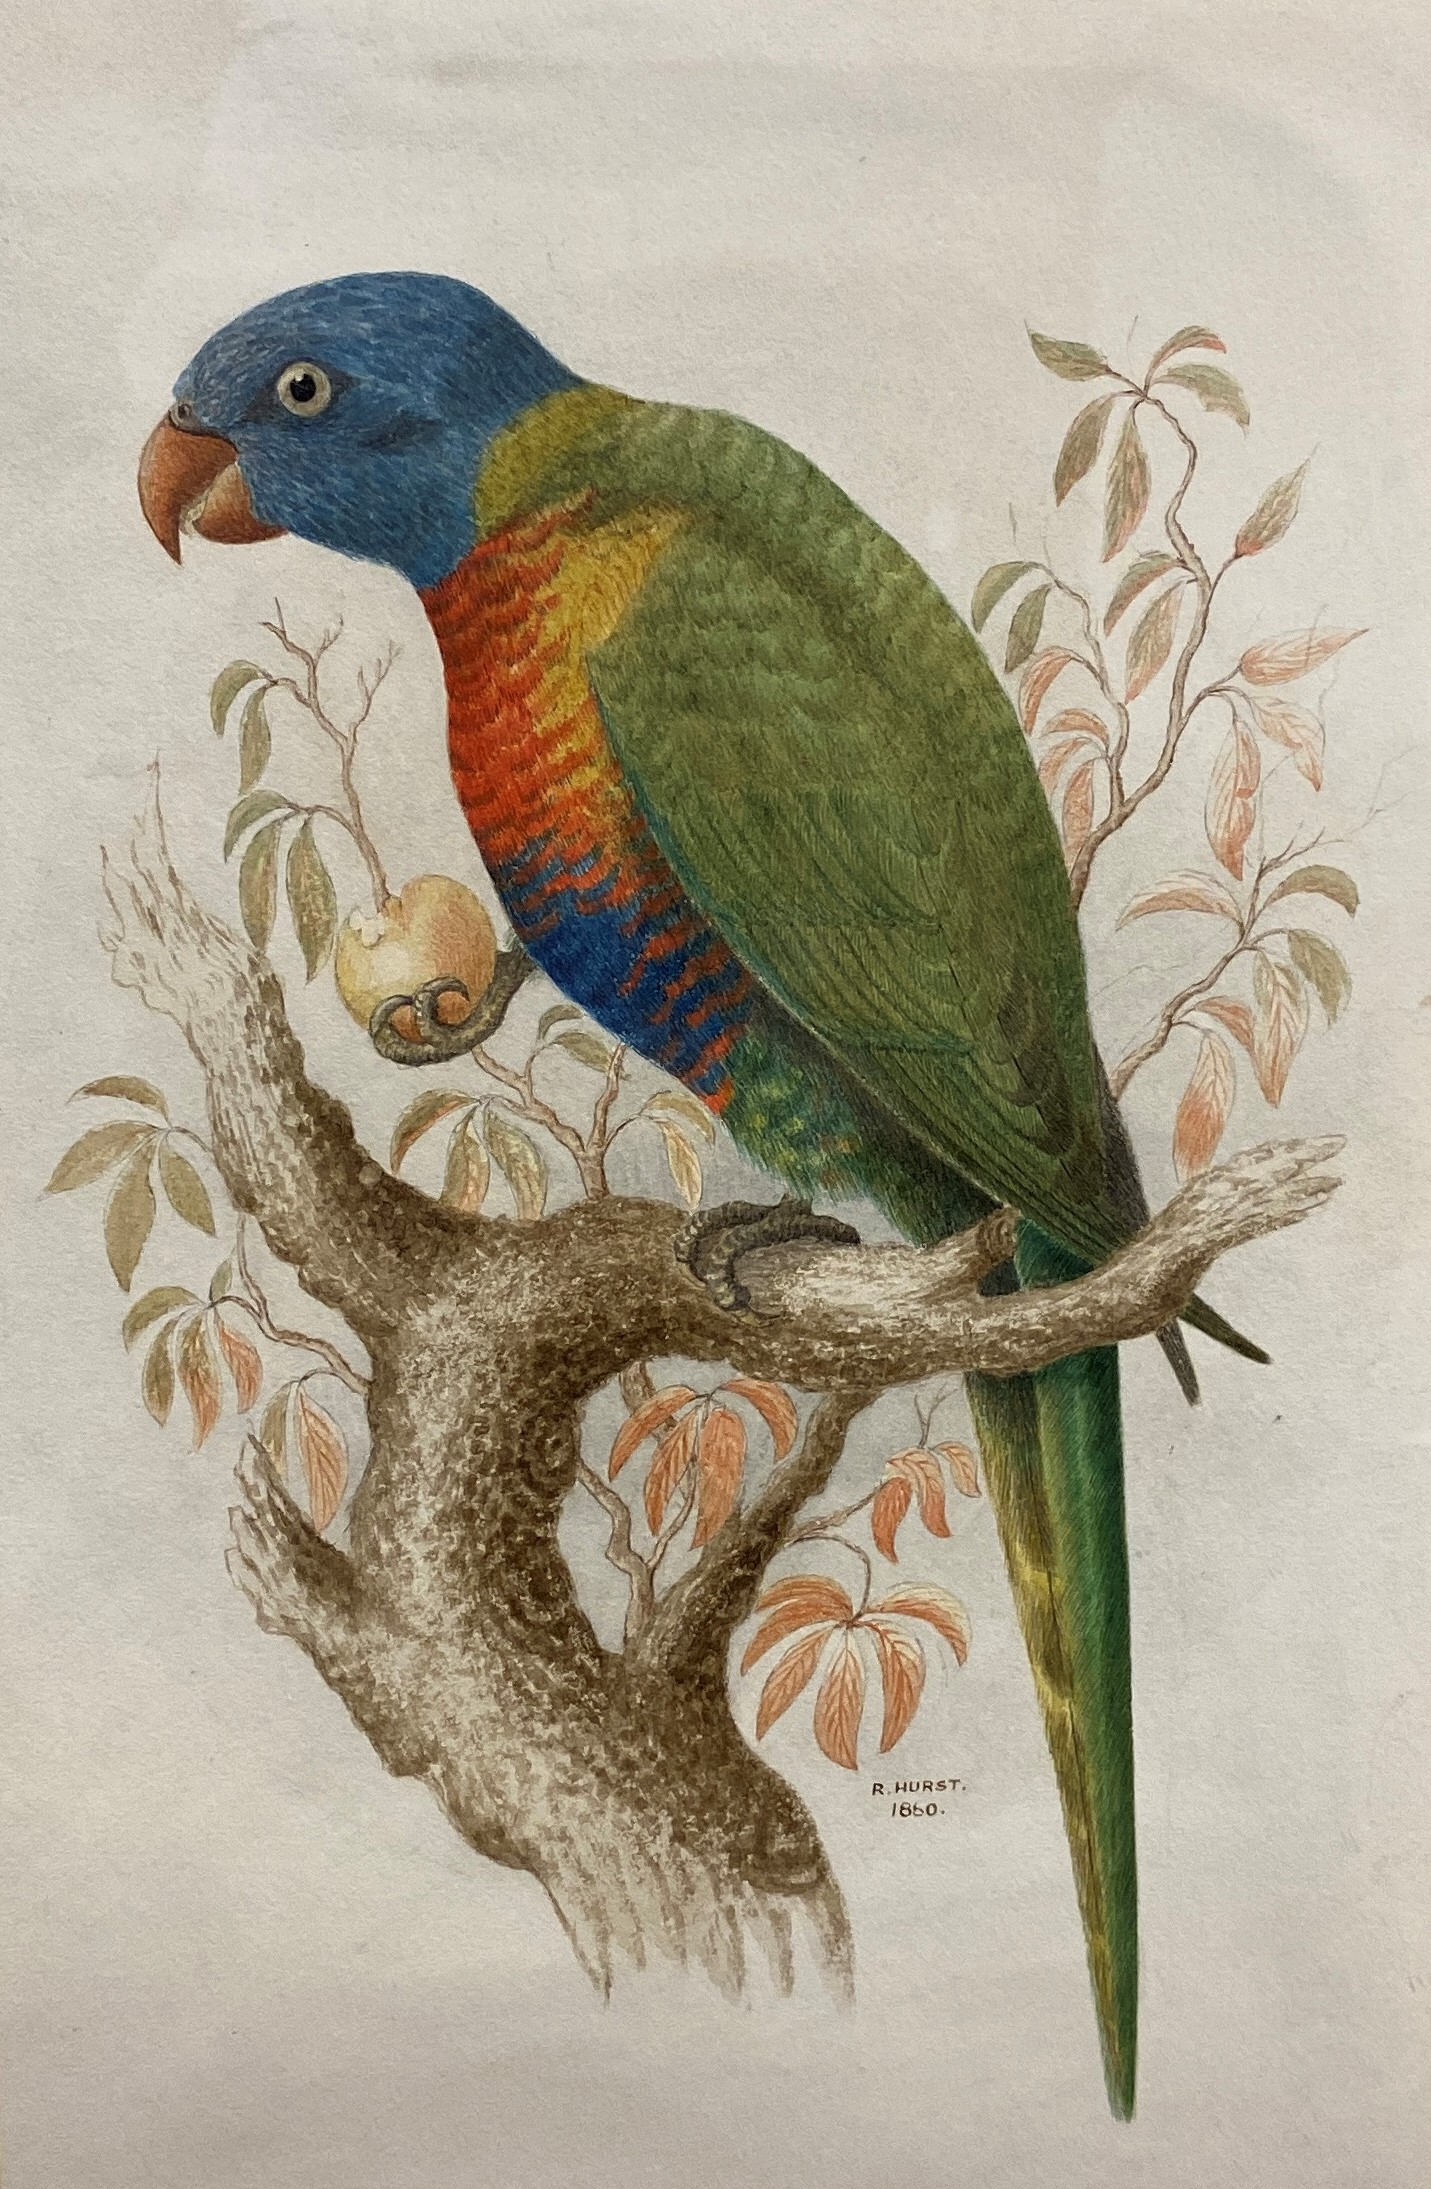 Lot 52 - Richard Hurst (Late 19th Century) 'The Blue-Bellied Lory', a study of a Rainbow Lorikeet,